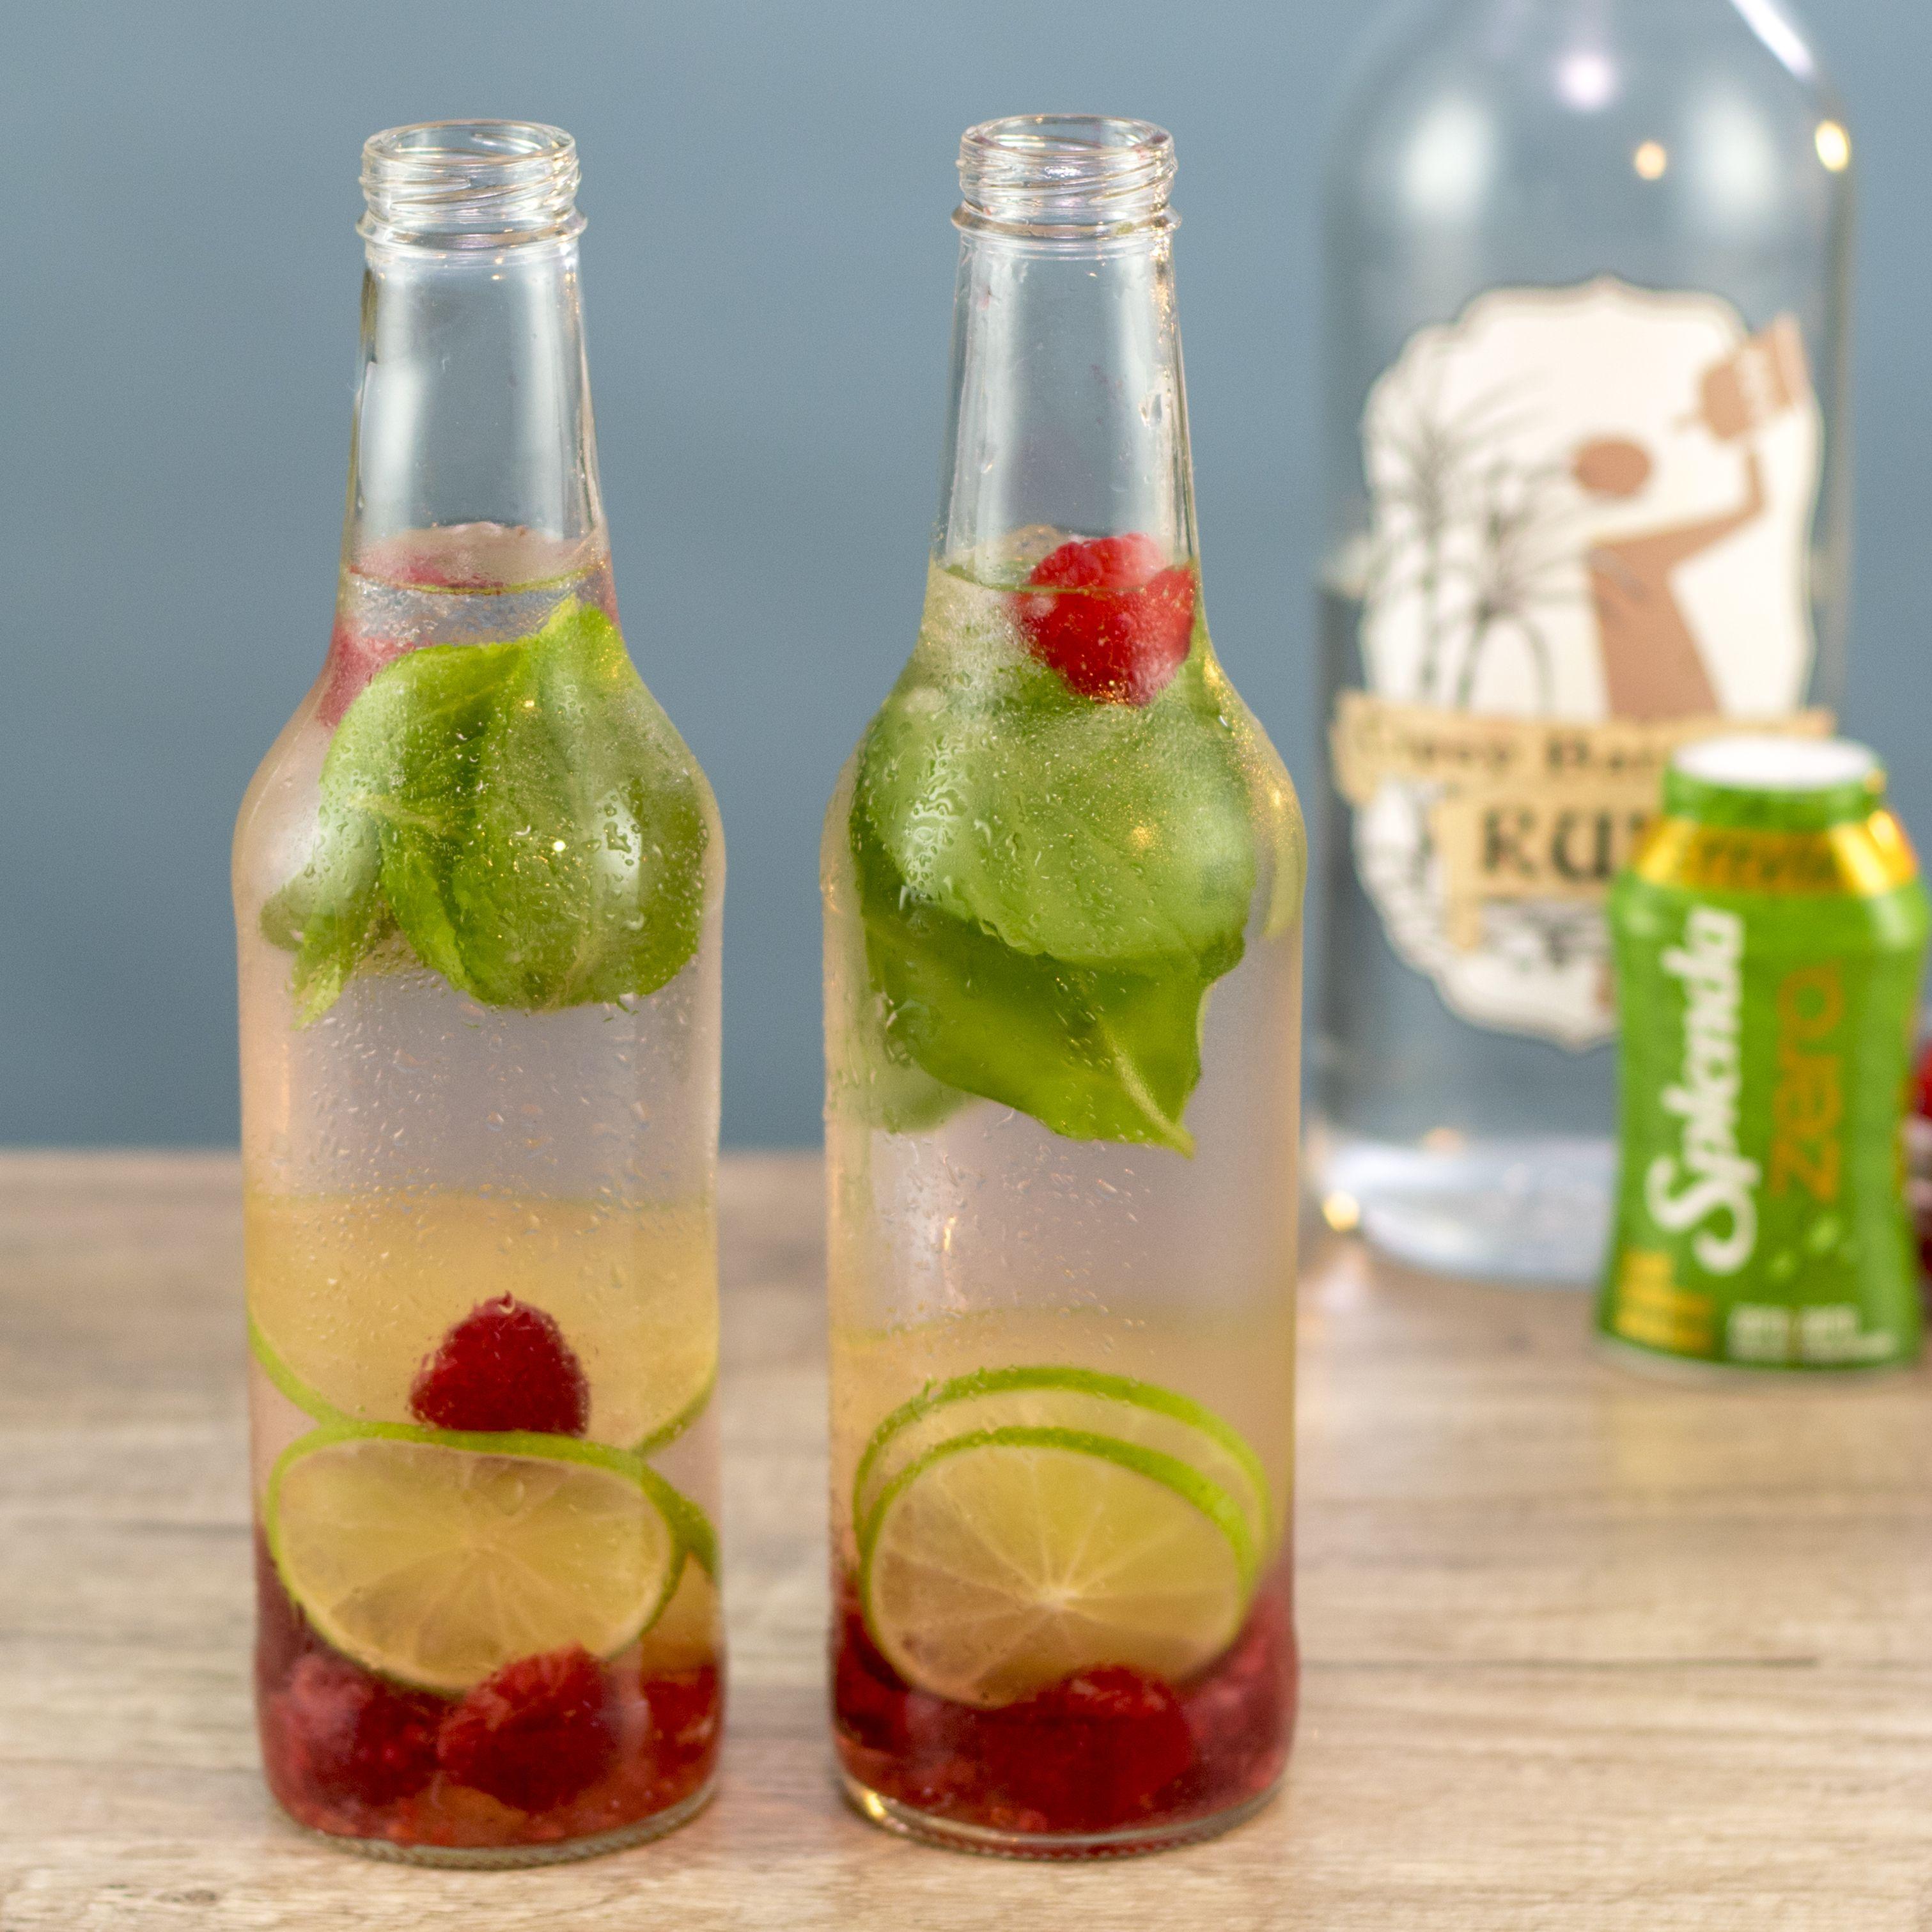 100 Calorie Raspberry Mojito Tipsy Bartender Recipe Fruity Mixed Drinks Frozen Drinks Alcohol Raspberry Mojito